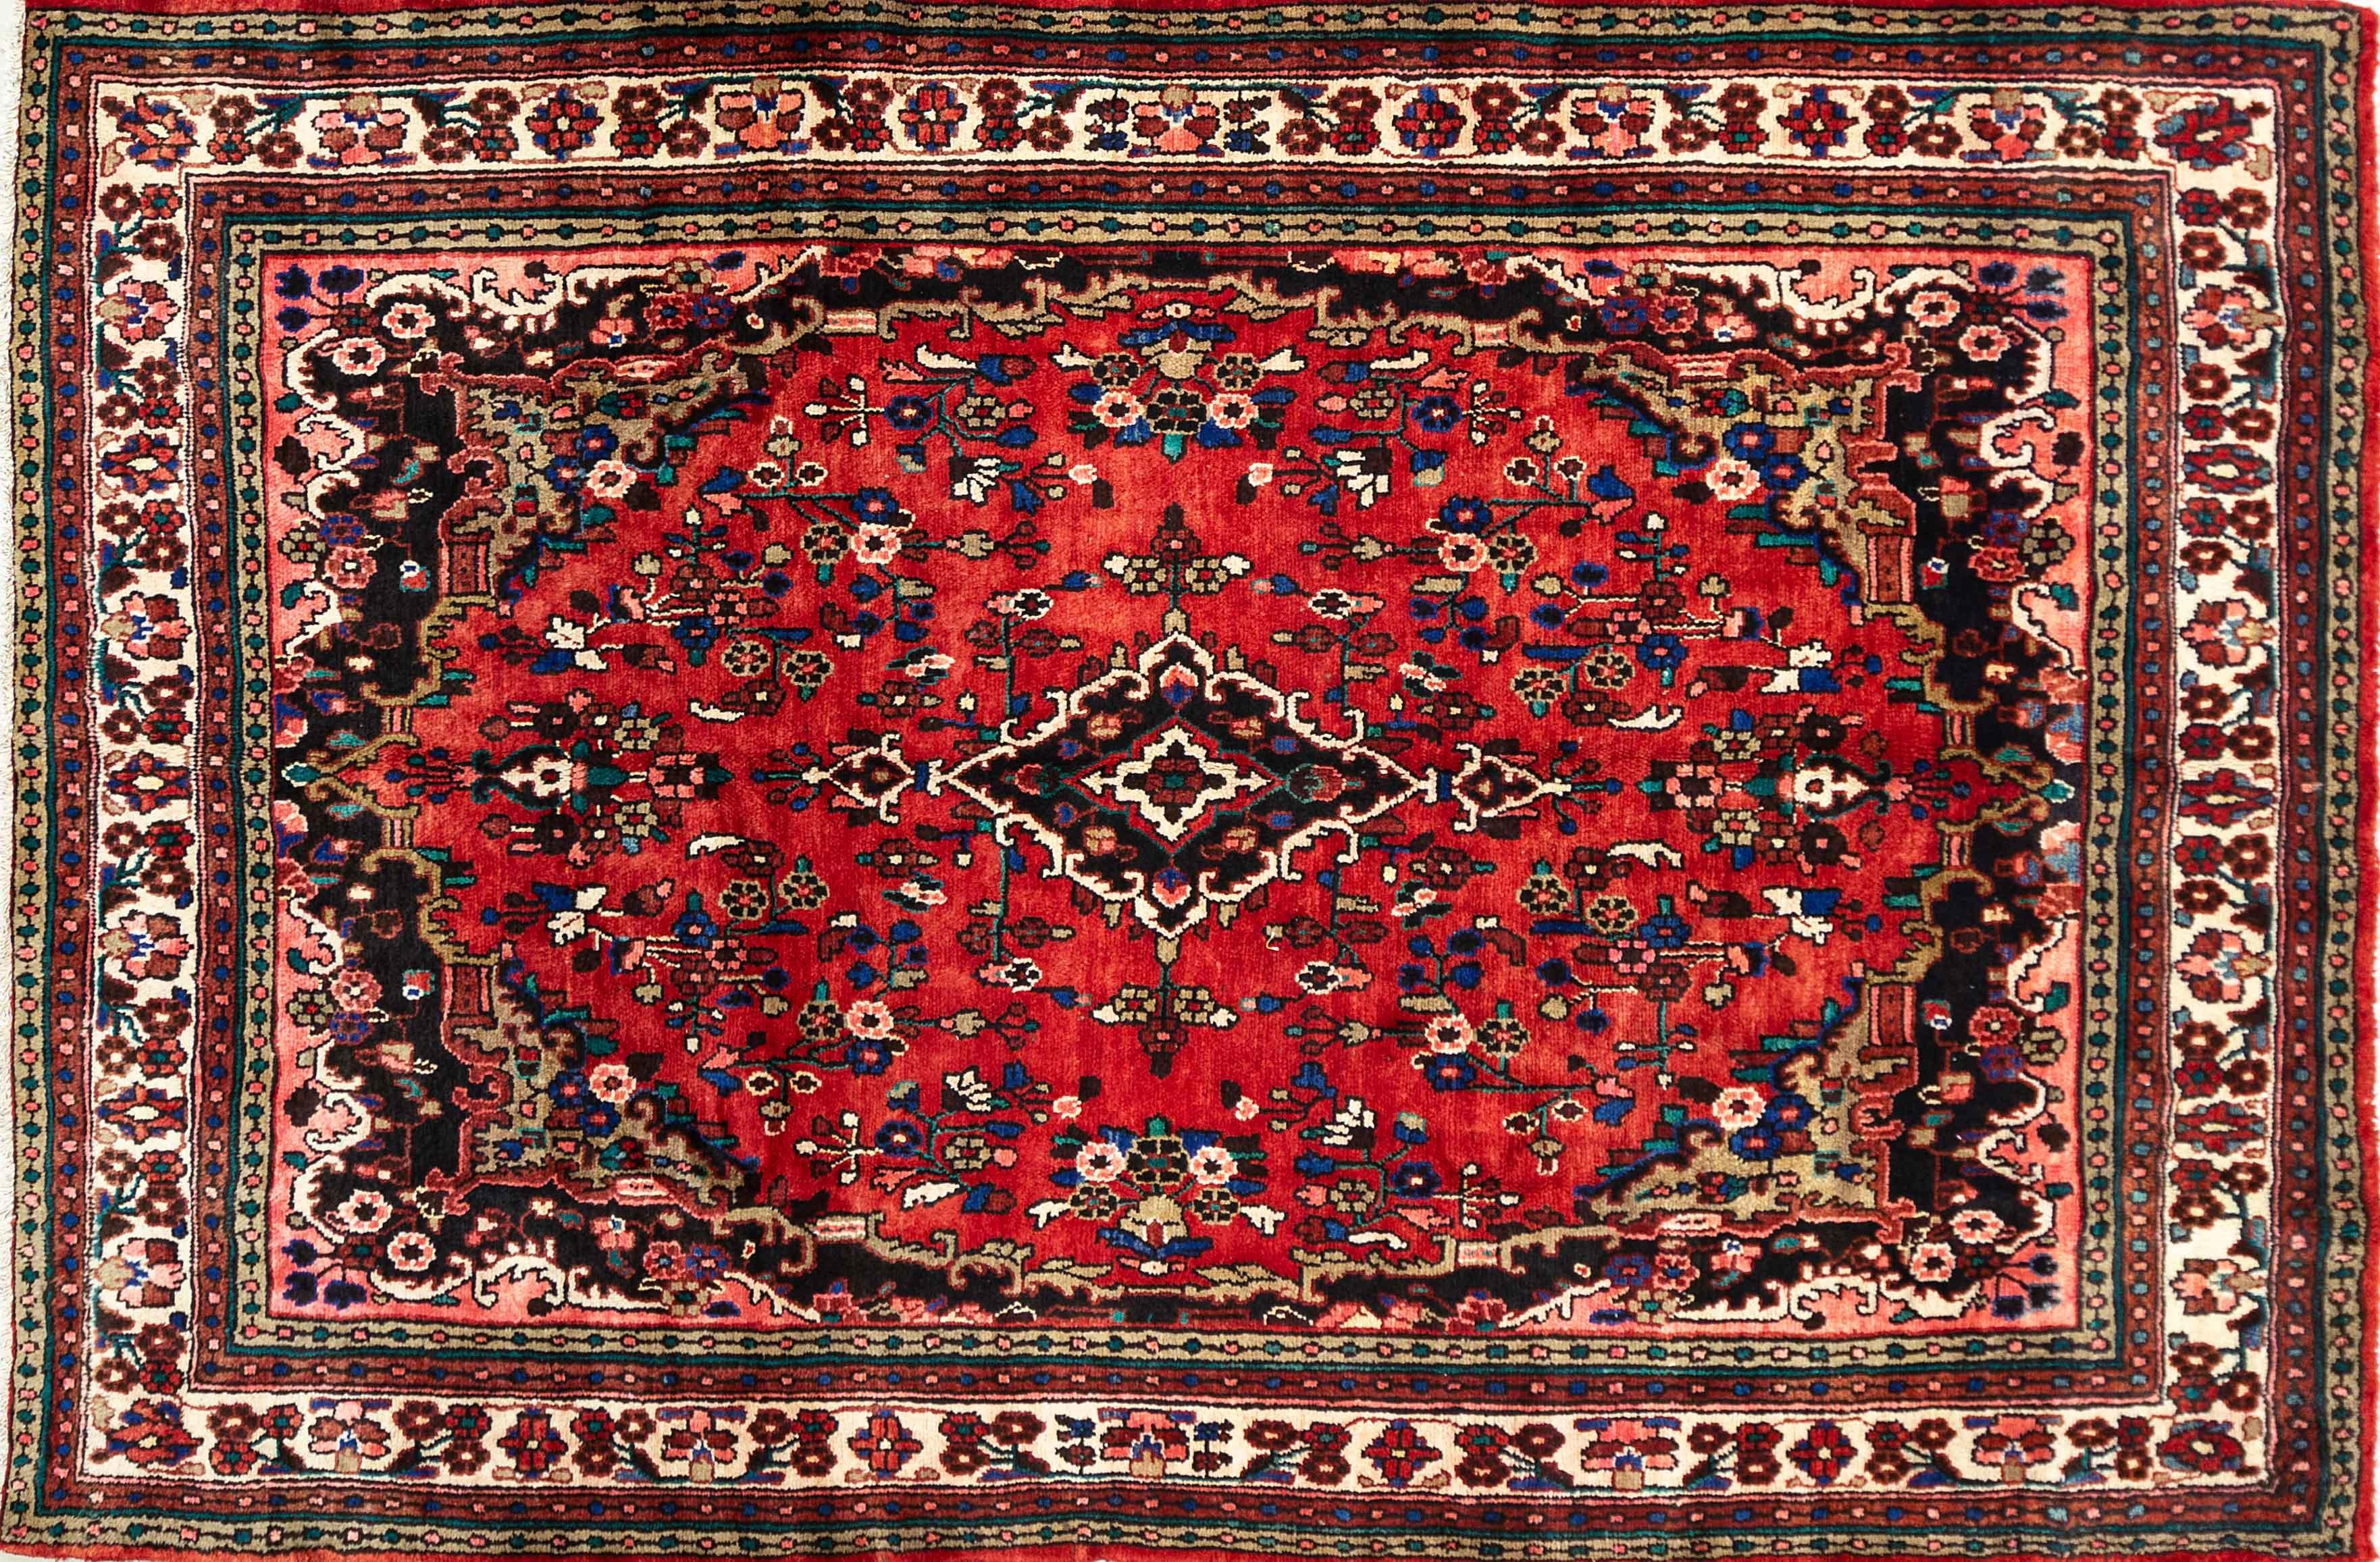 A Persian Hand Knotted Hamadan Carpet, 314 X 208